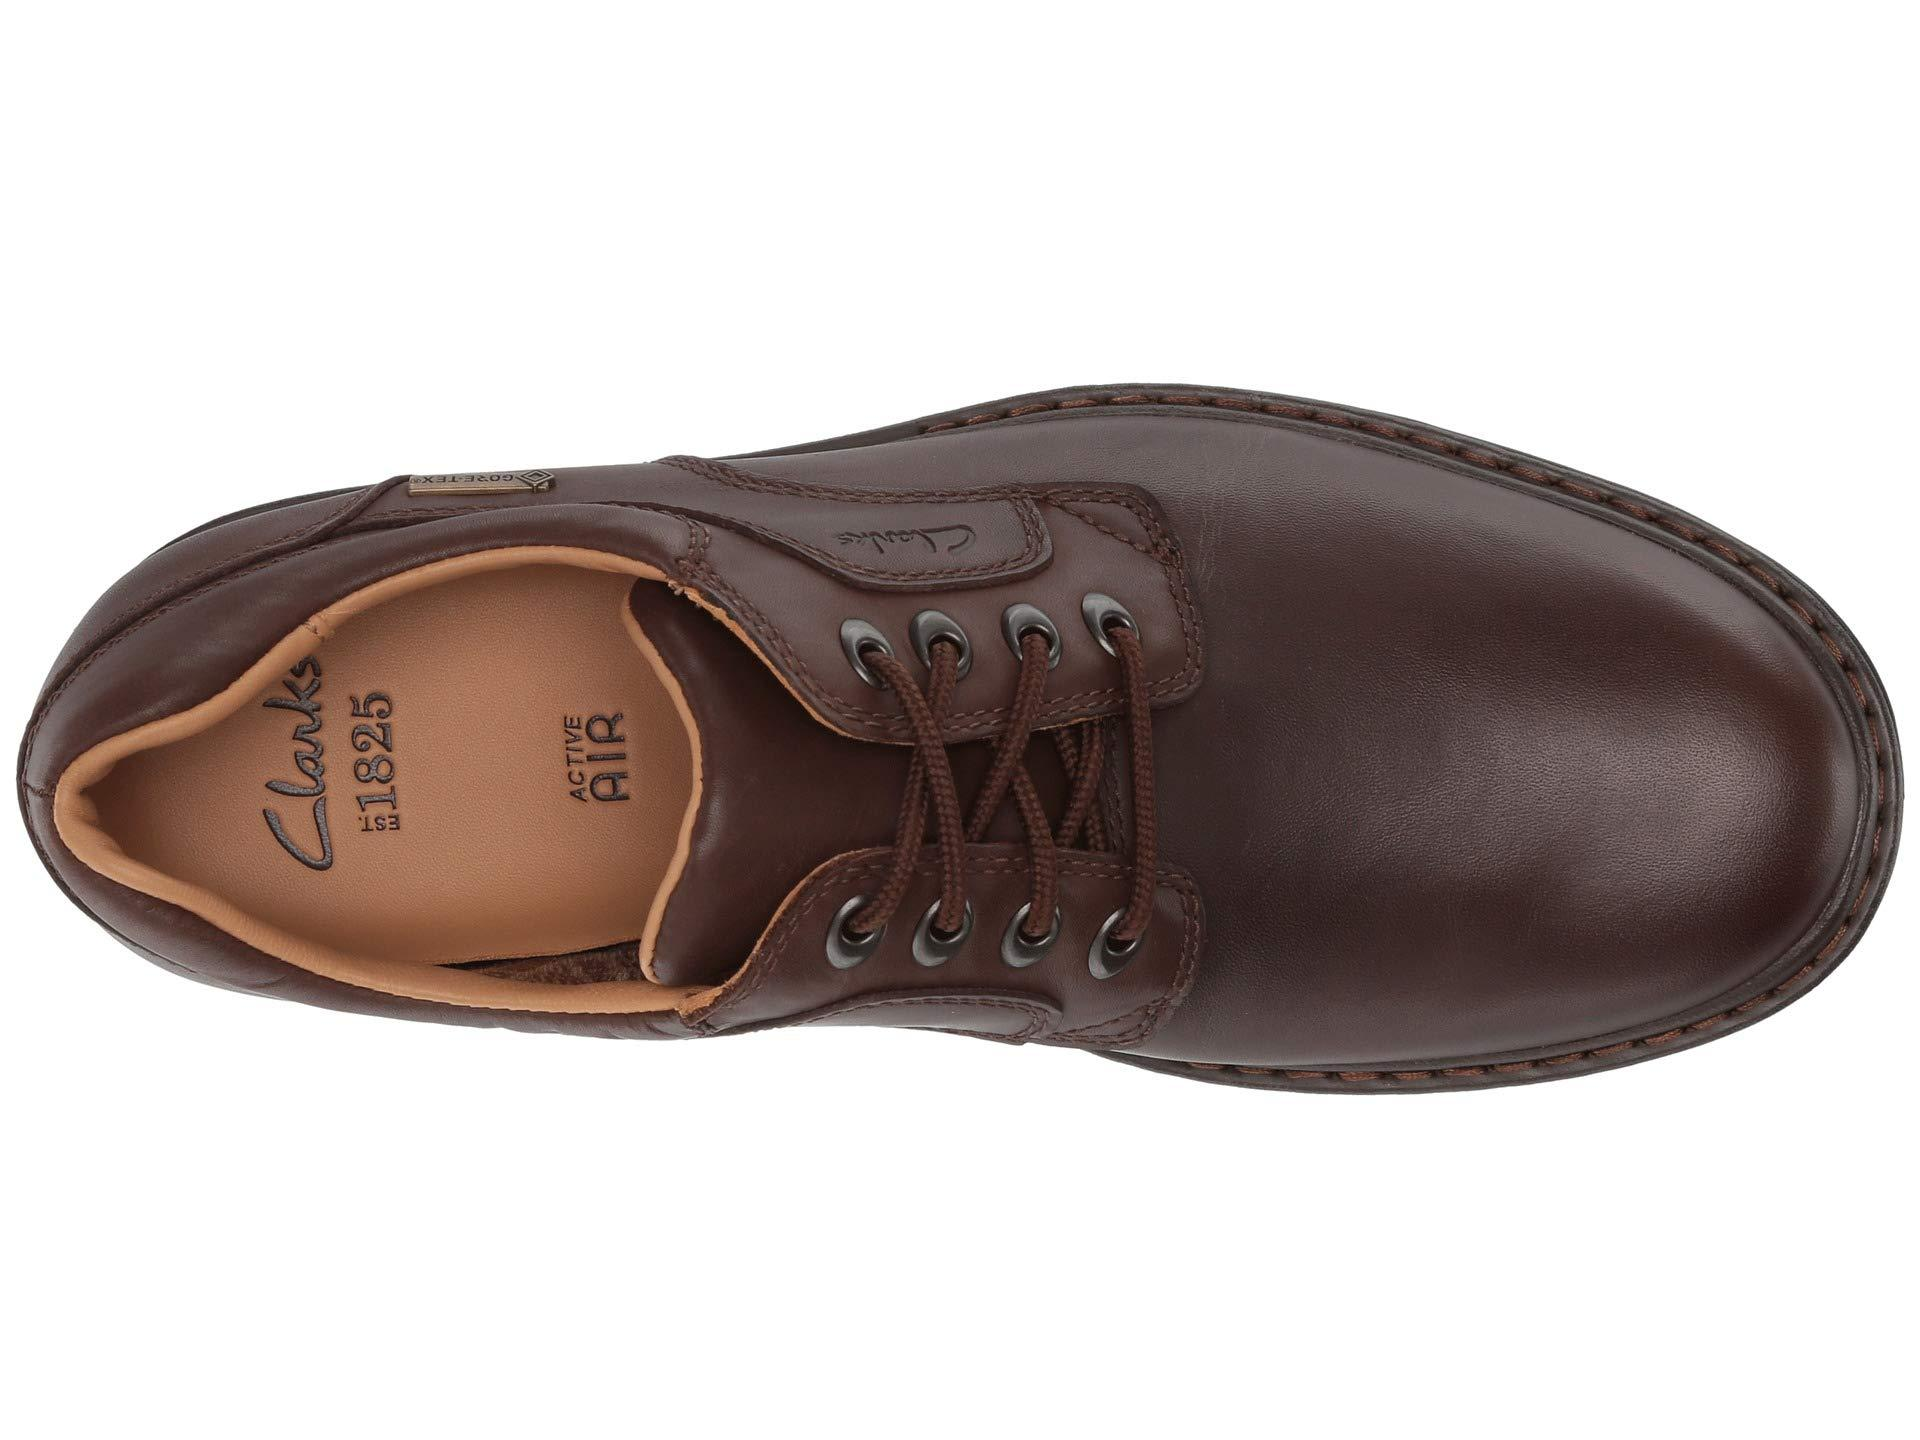 Clarks Leather Rockie Lo Gtx in 0